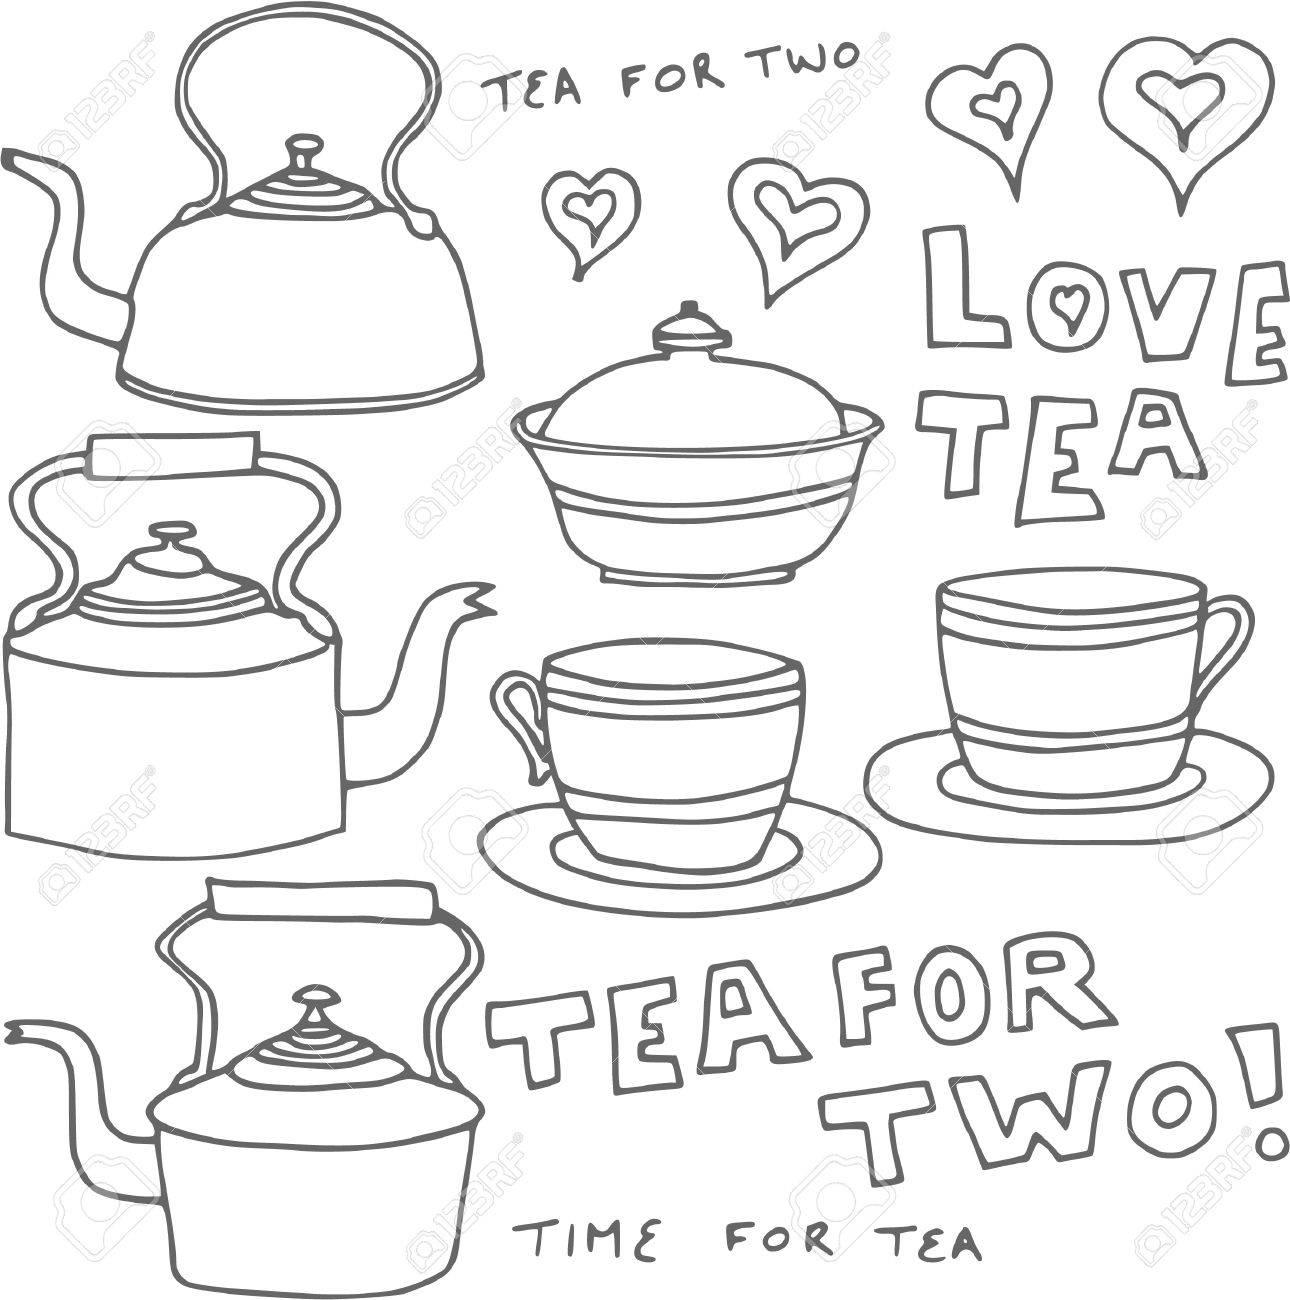 Vintage Tea Design Elements Stock Vector - 10043633